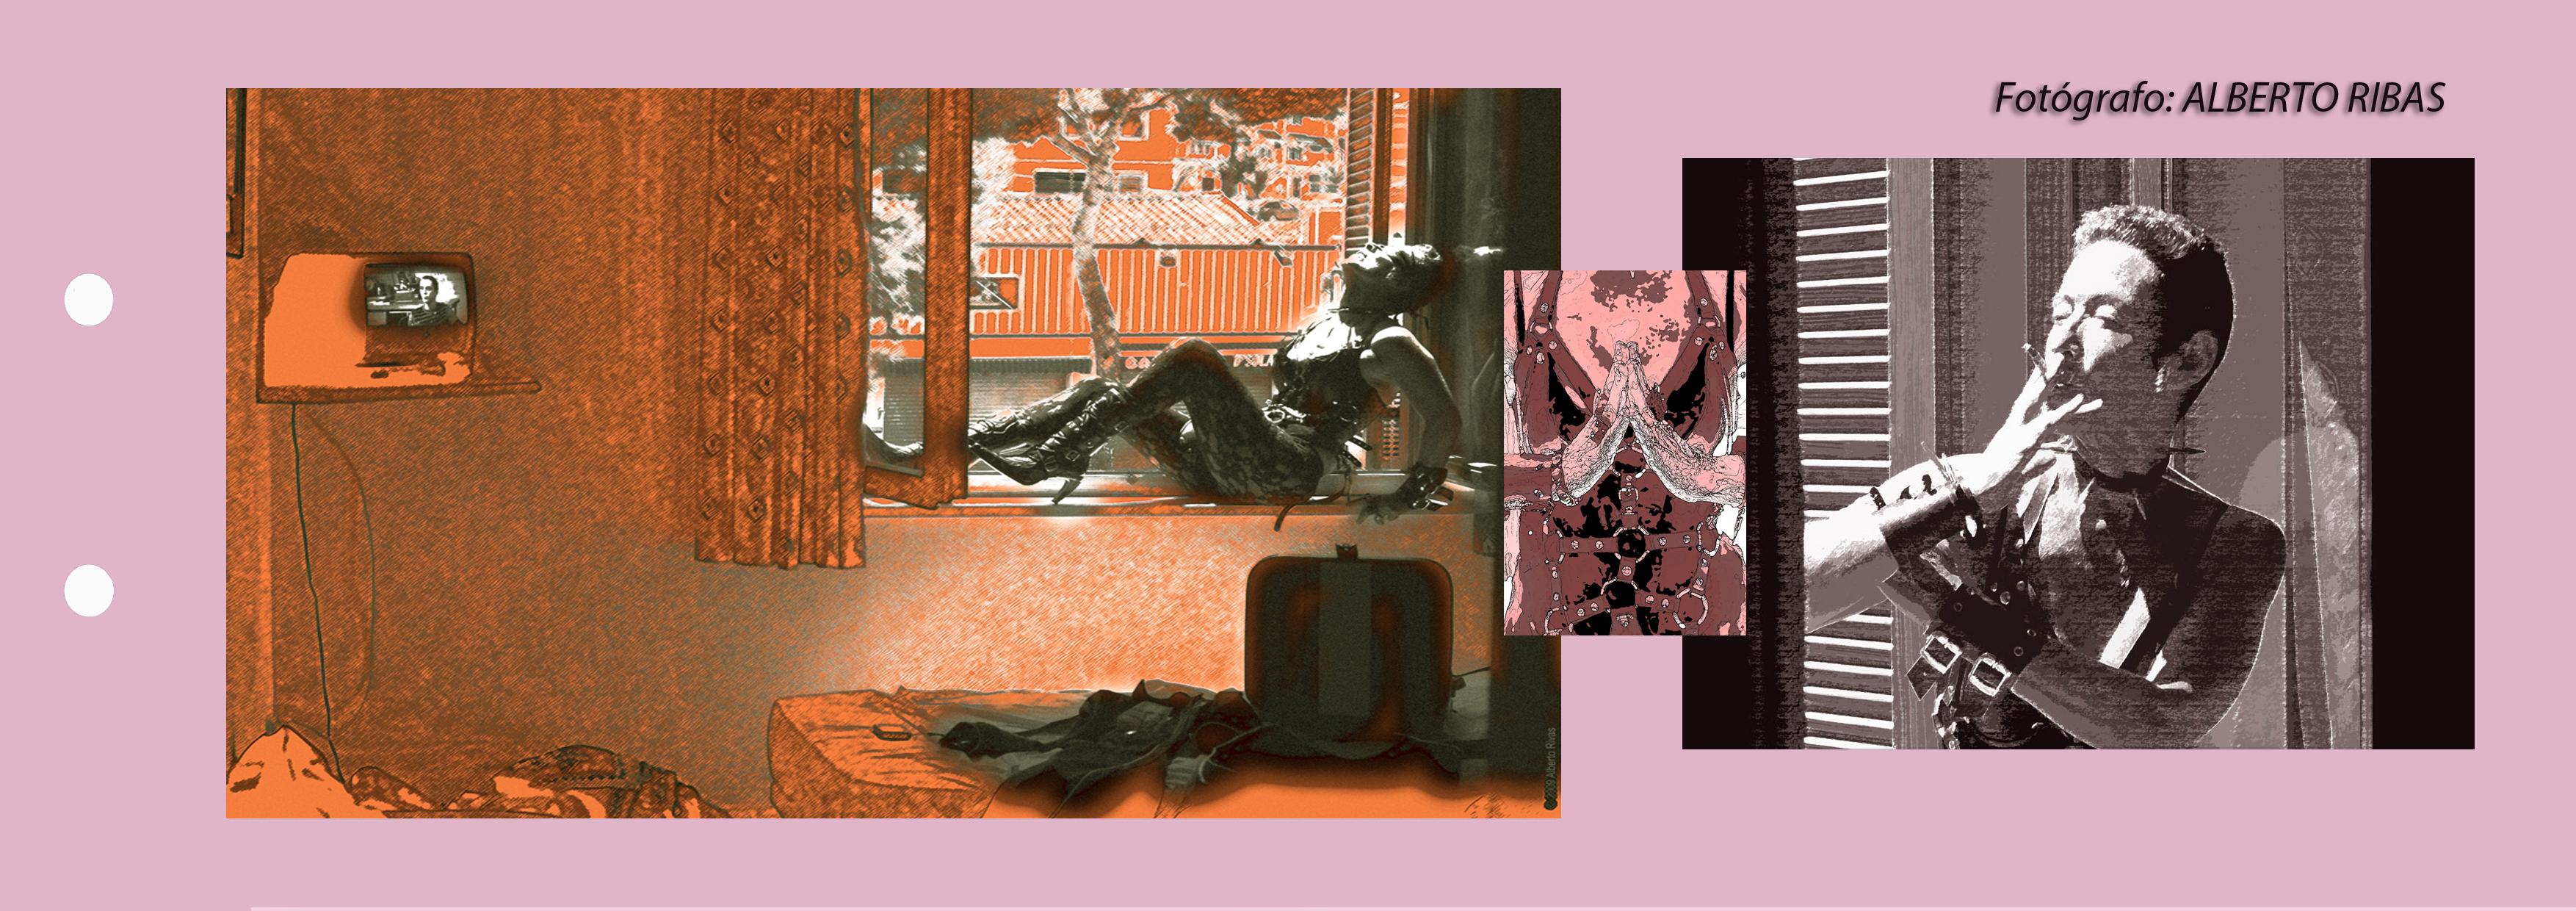 3-catalogo-ALBERTORIBAS-3-HABITACION-ROK.jpg